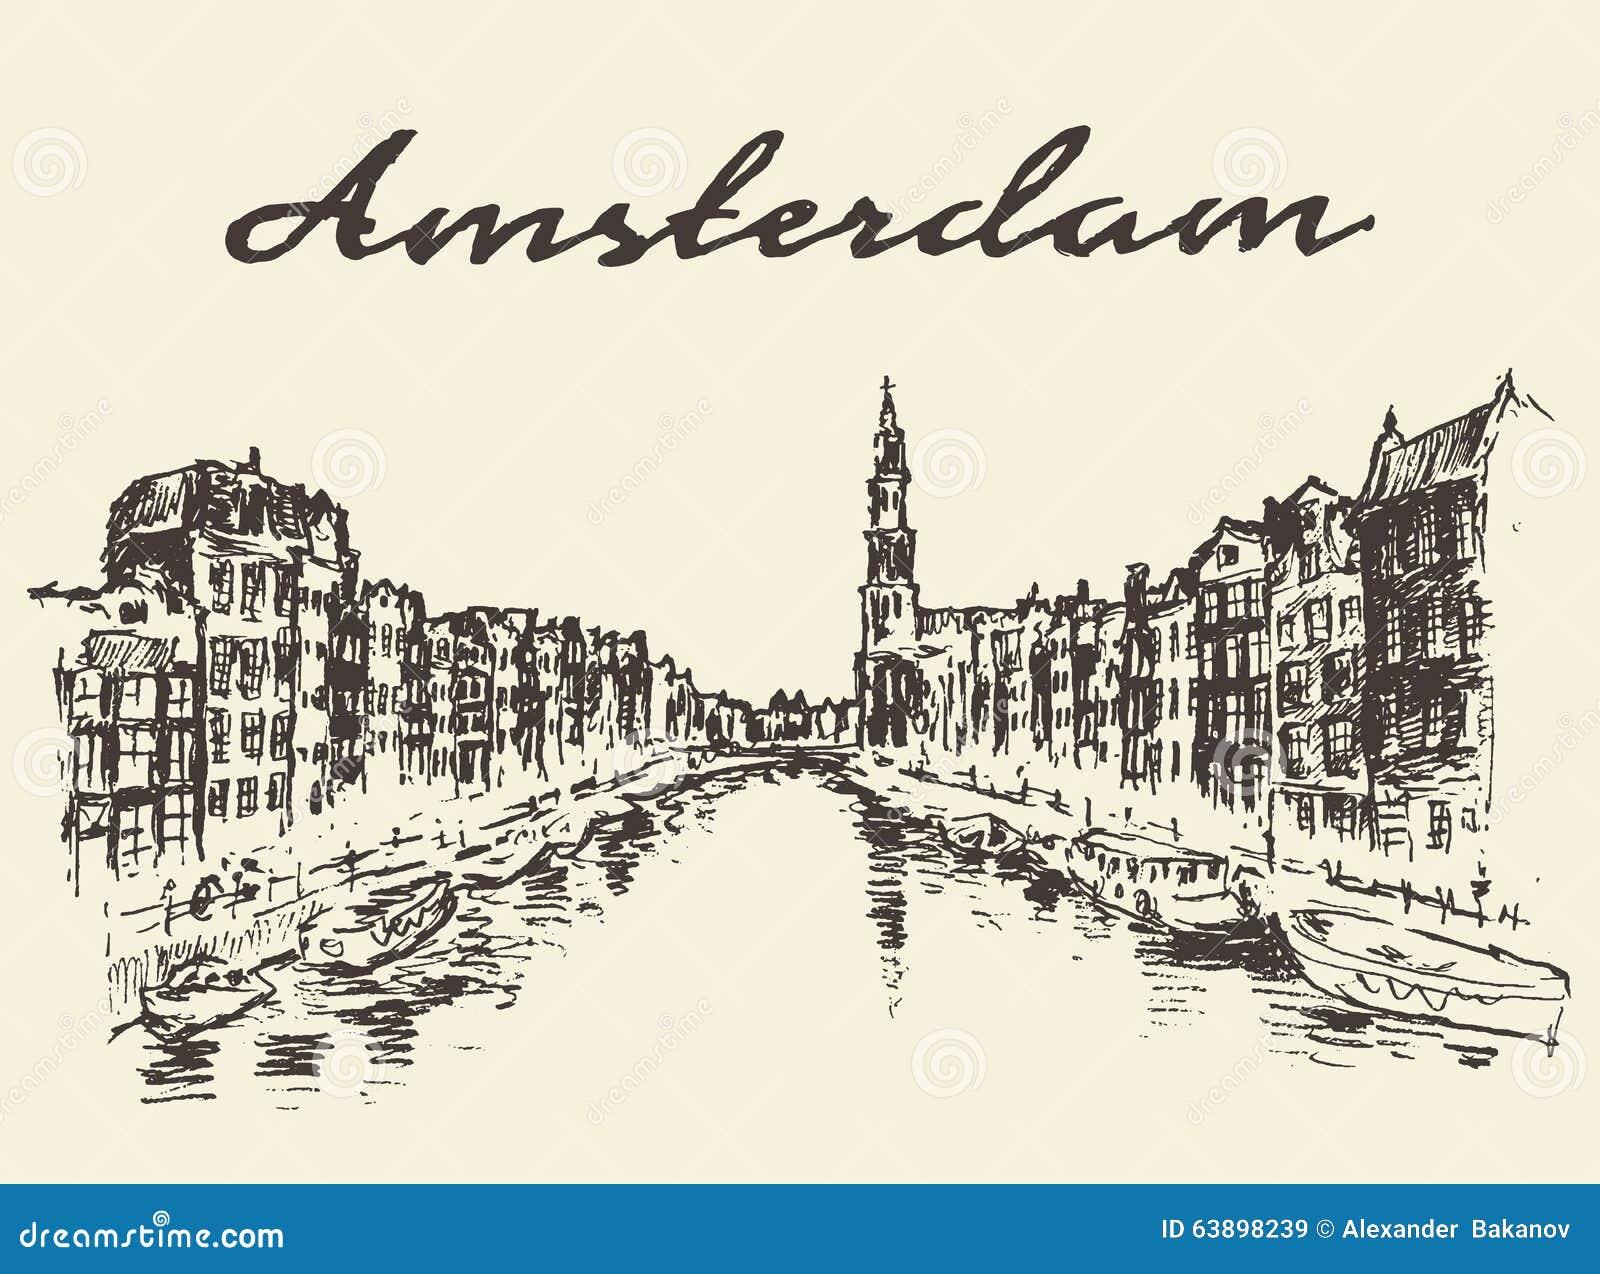 Streets Amsterdam vector illustration drawn sketch